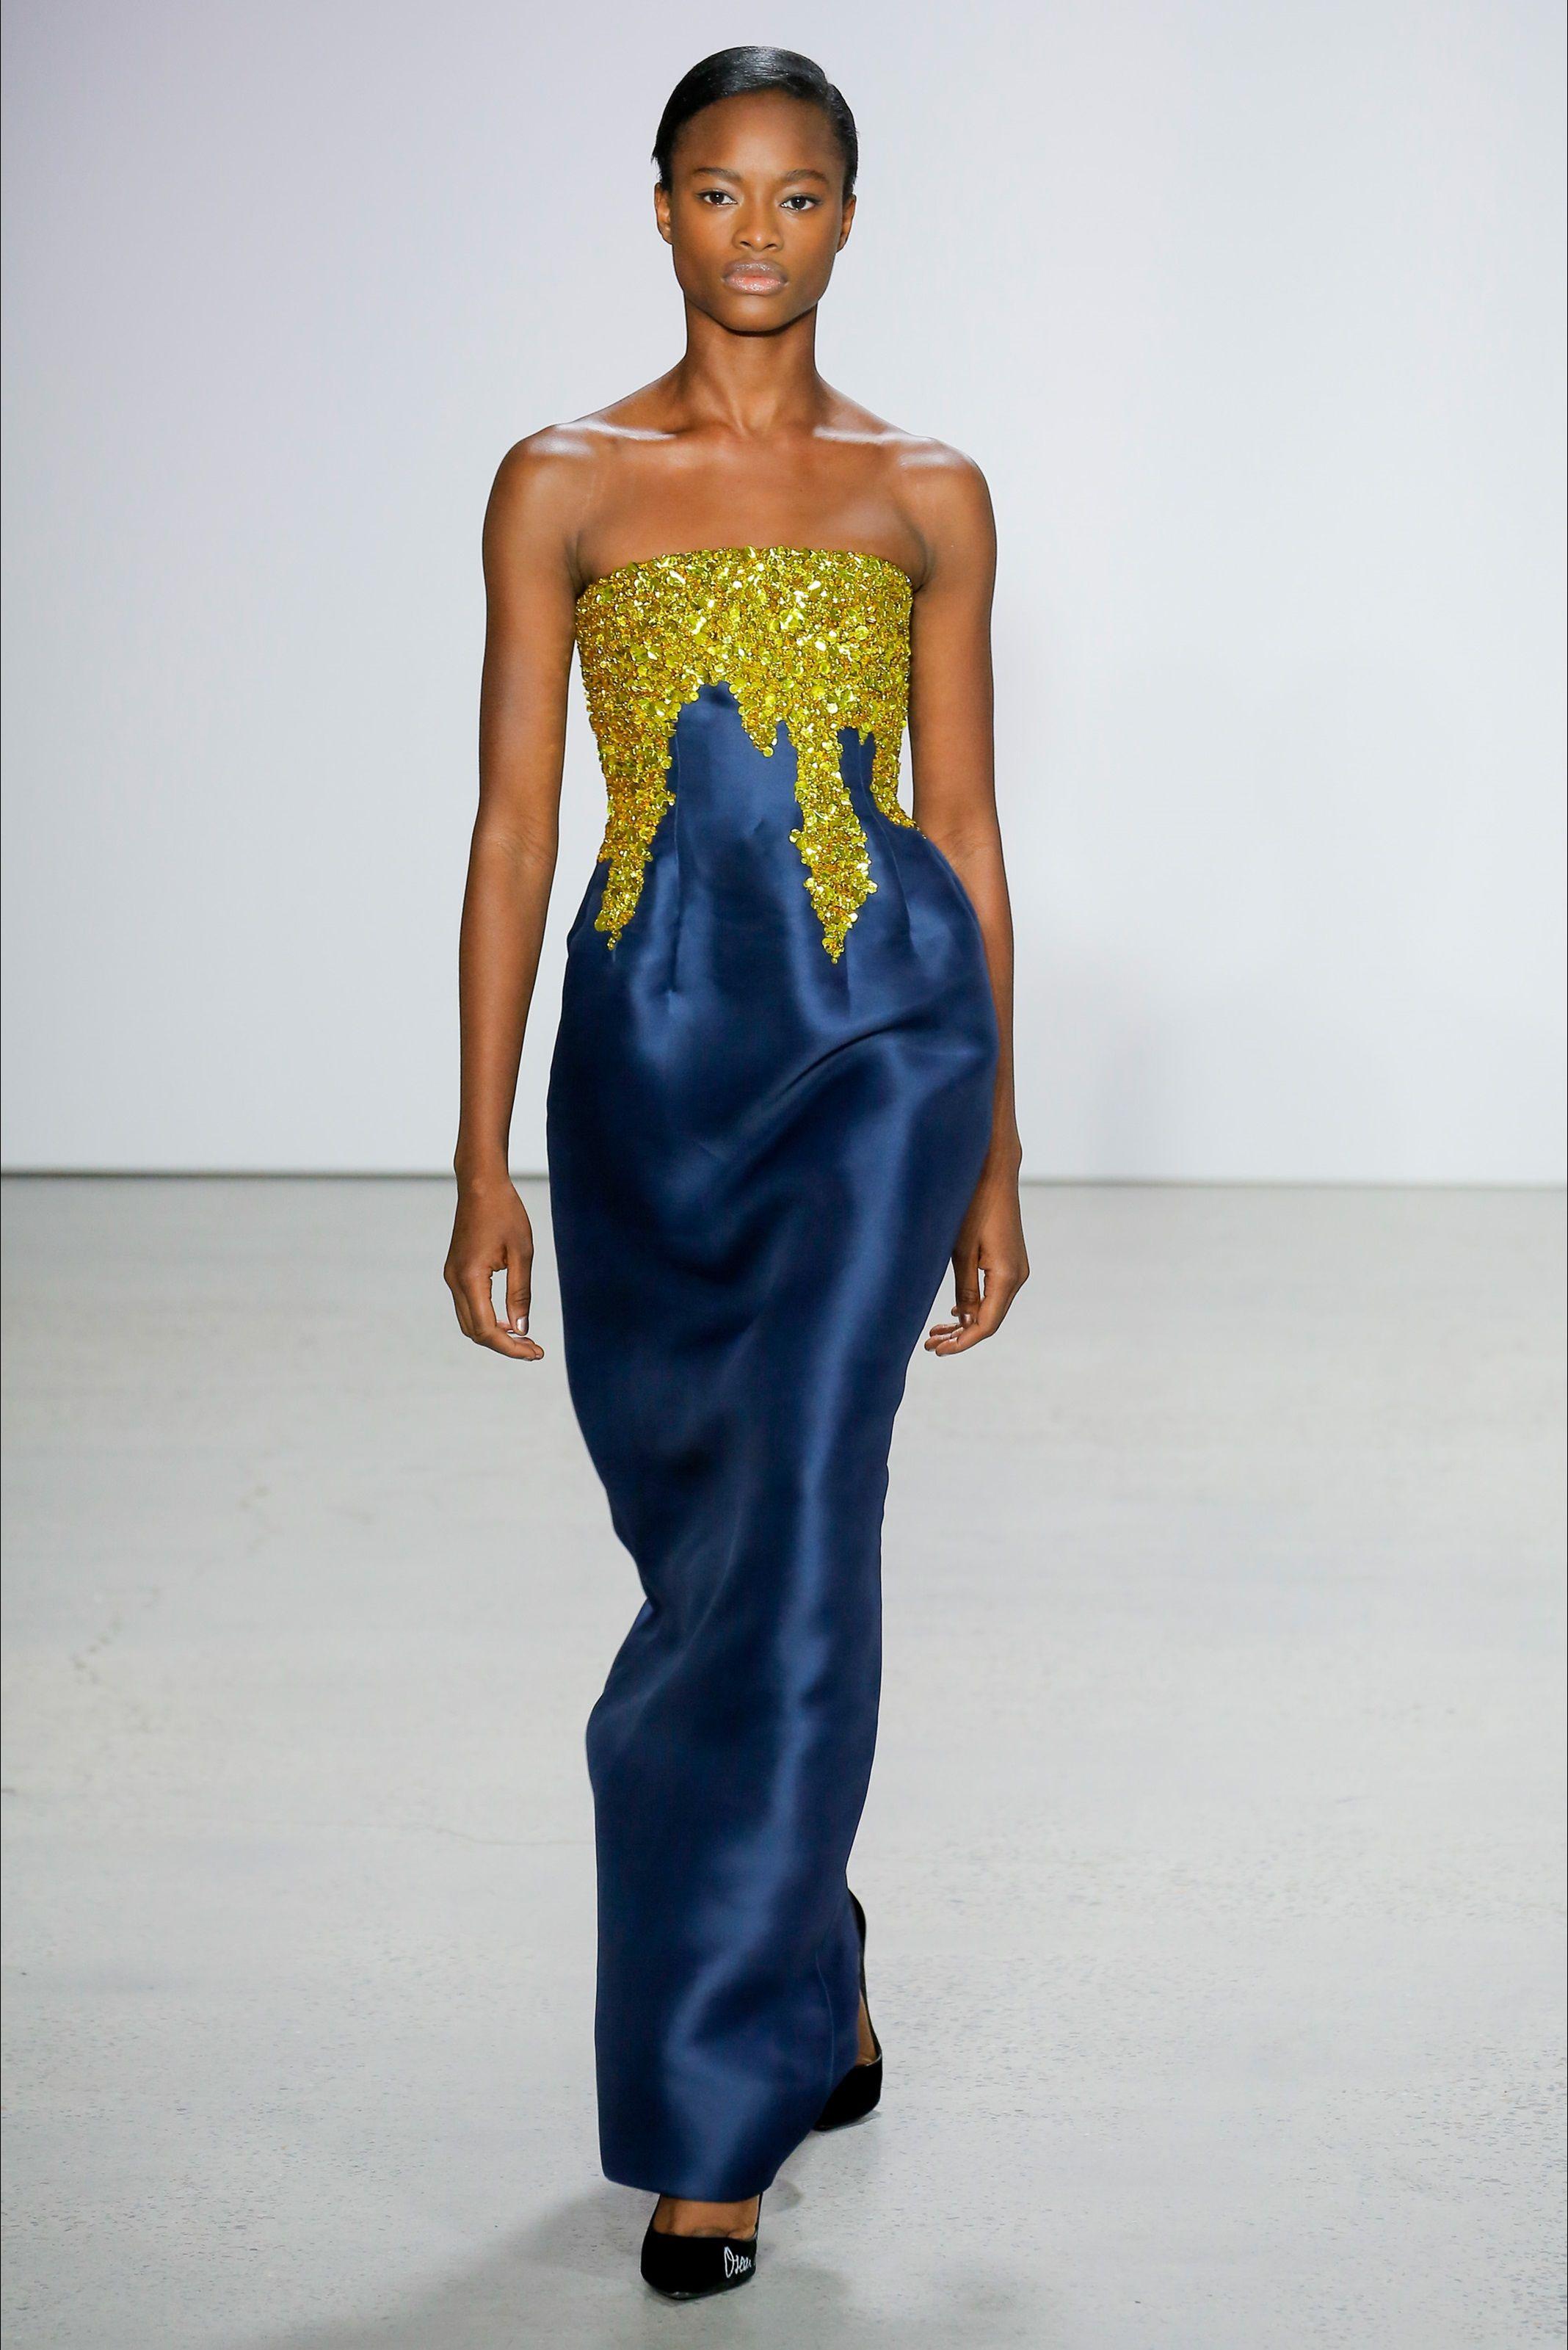 Mayowa Nicholas at the Oscar de la Renta fashion show ...